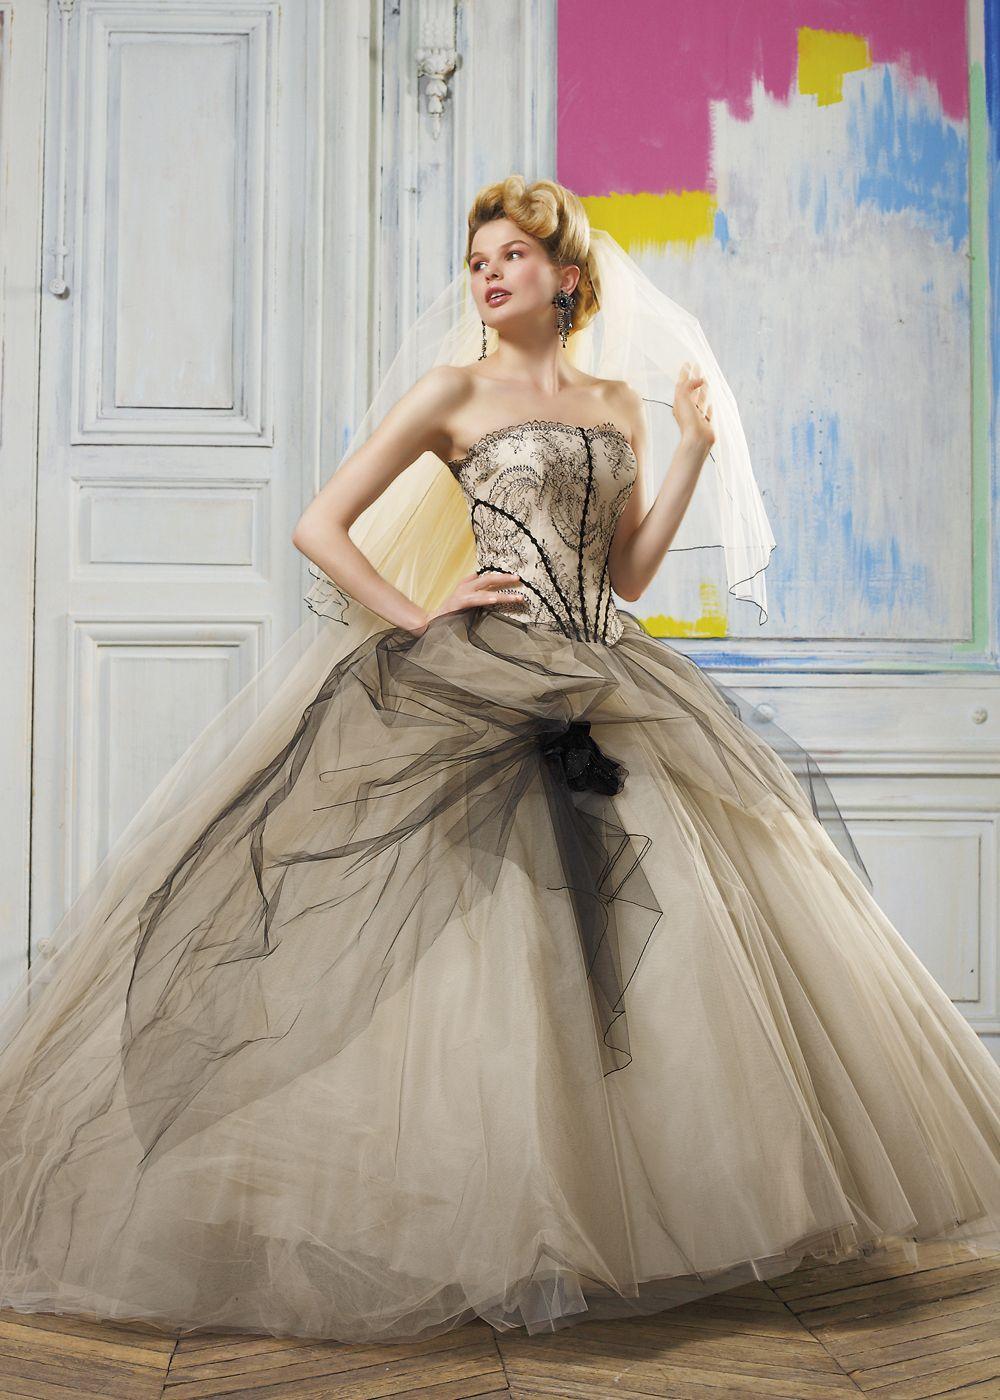 Halloweenweddingdresses wedding ideas pinterest halloween